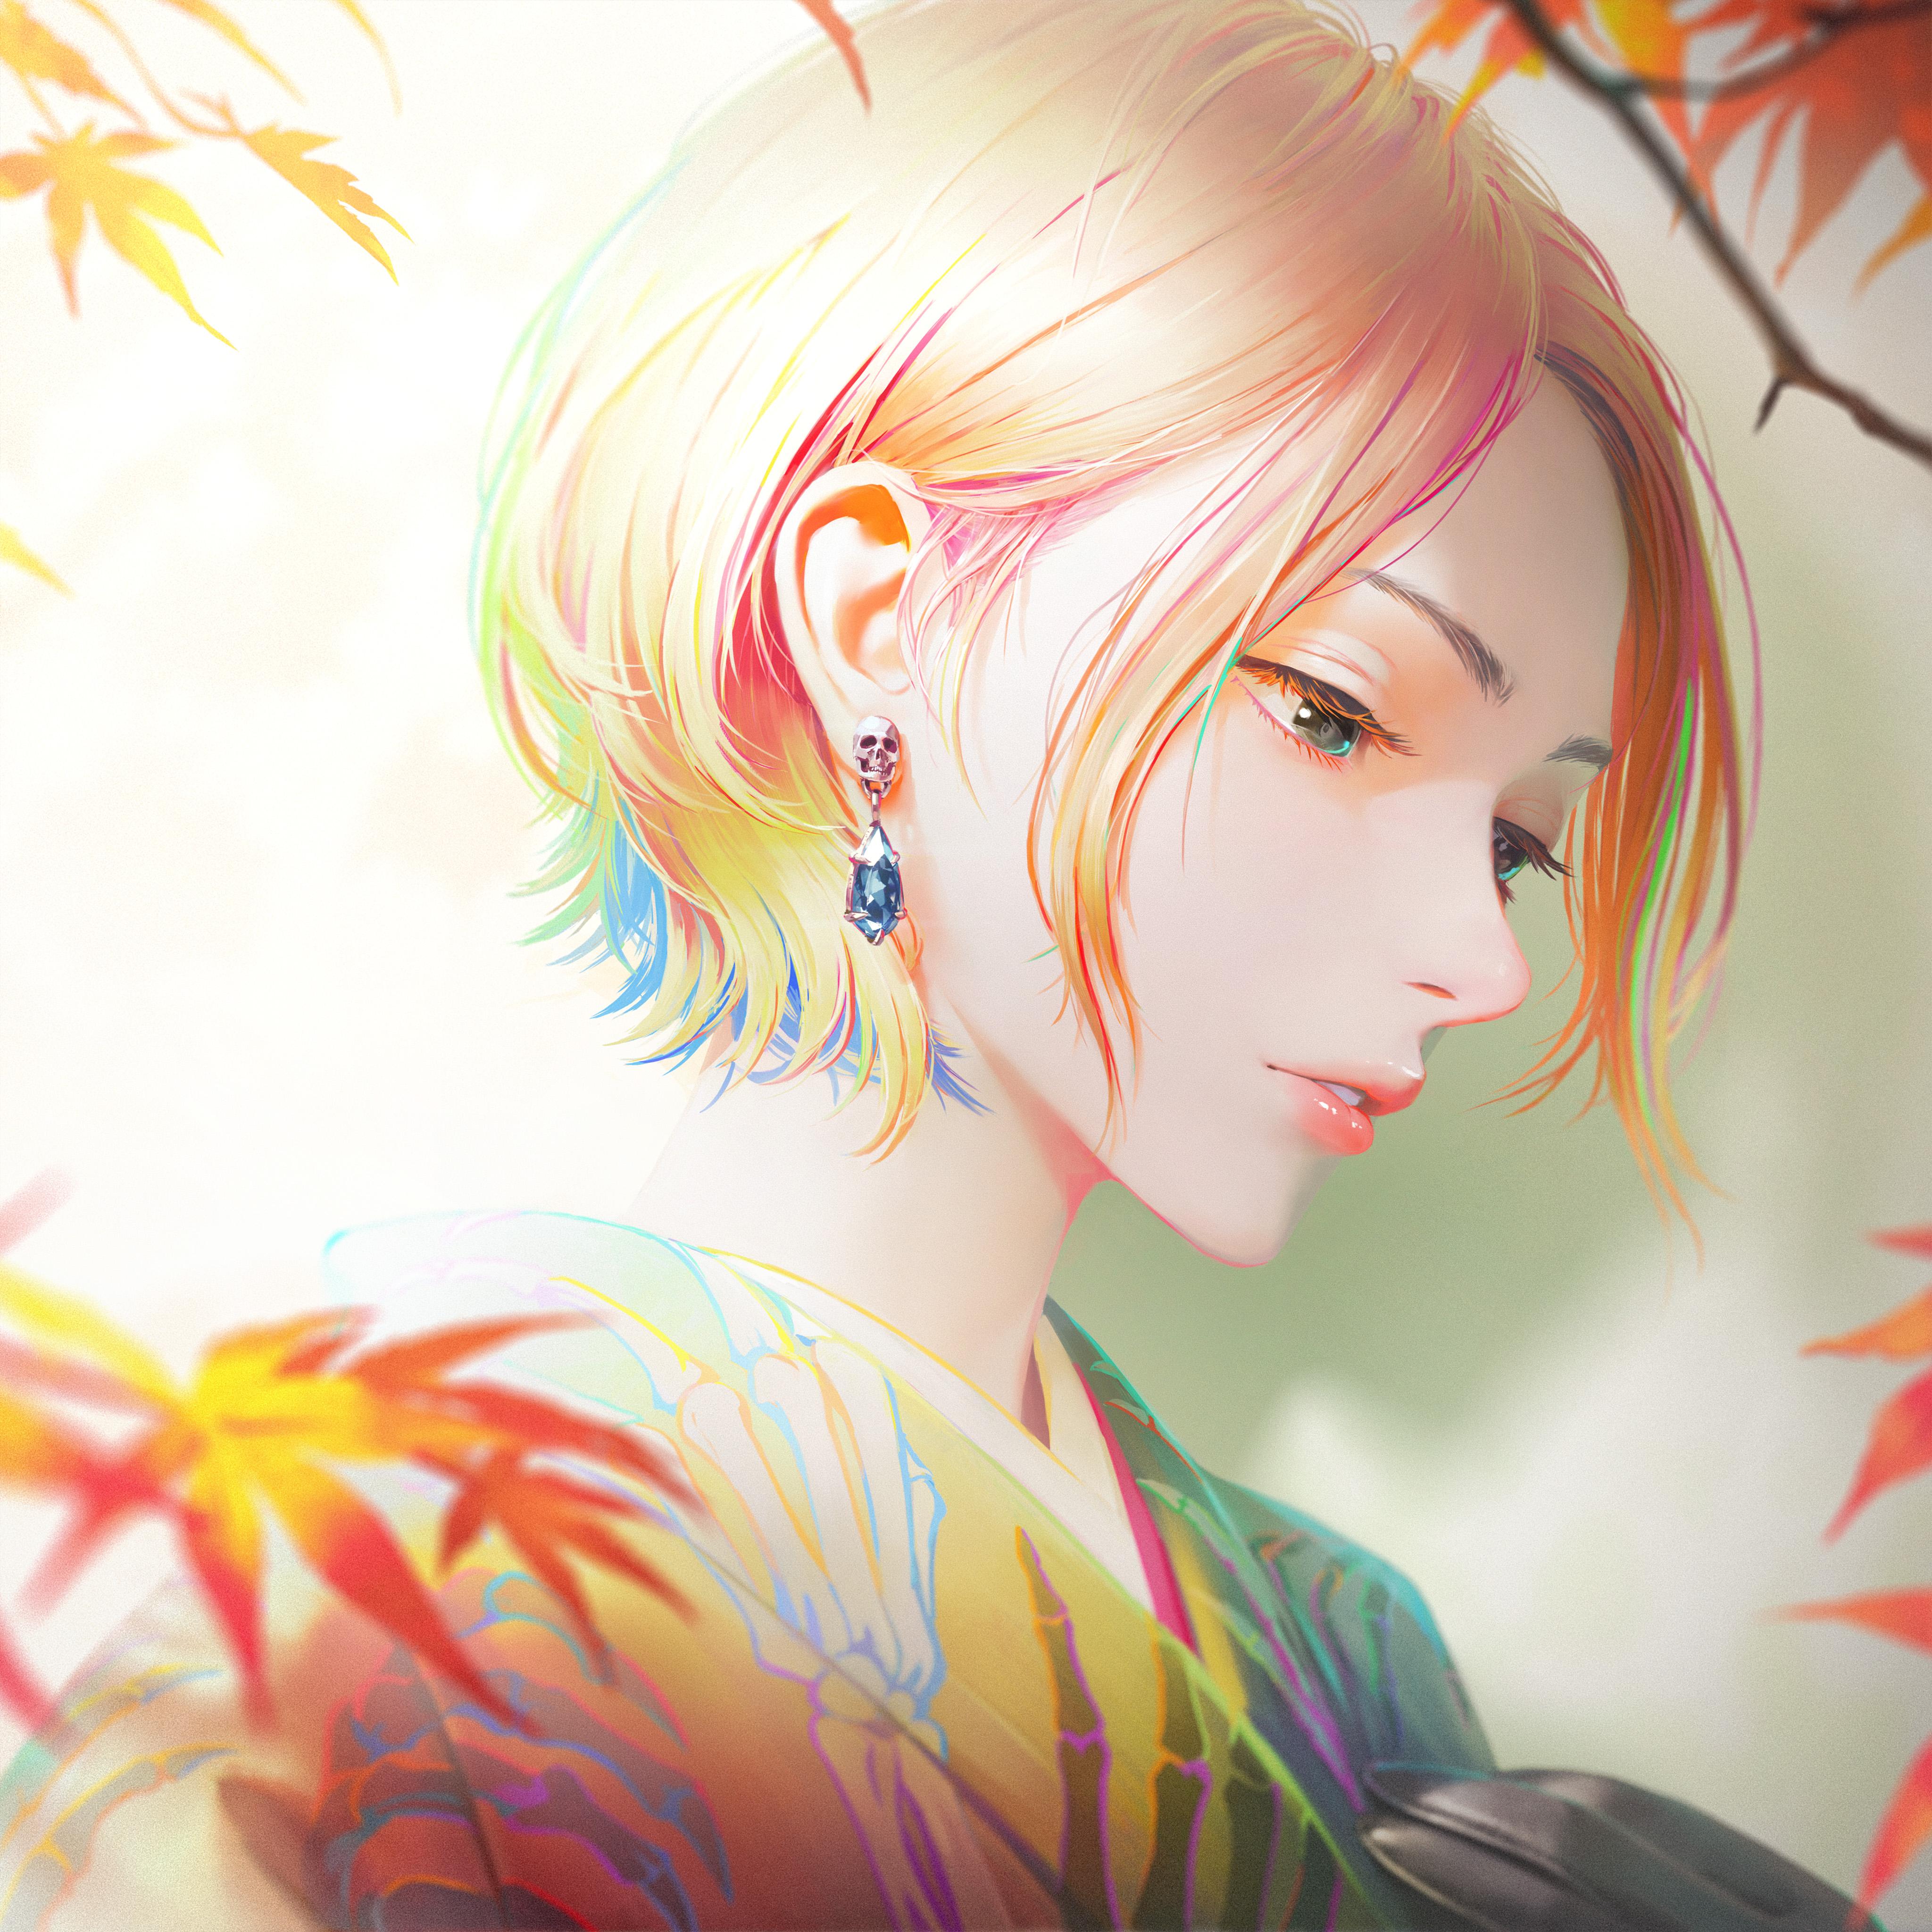 General 4096x4096 digital art artwork 2D NaBaBa (DeviantArt) Arata Yokoyama fall women face short hair